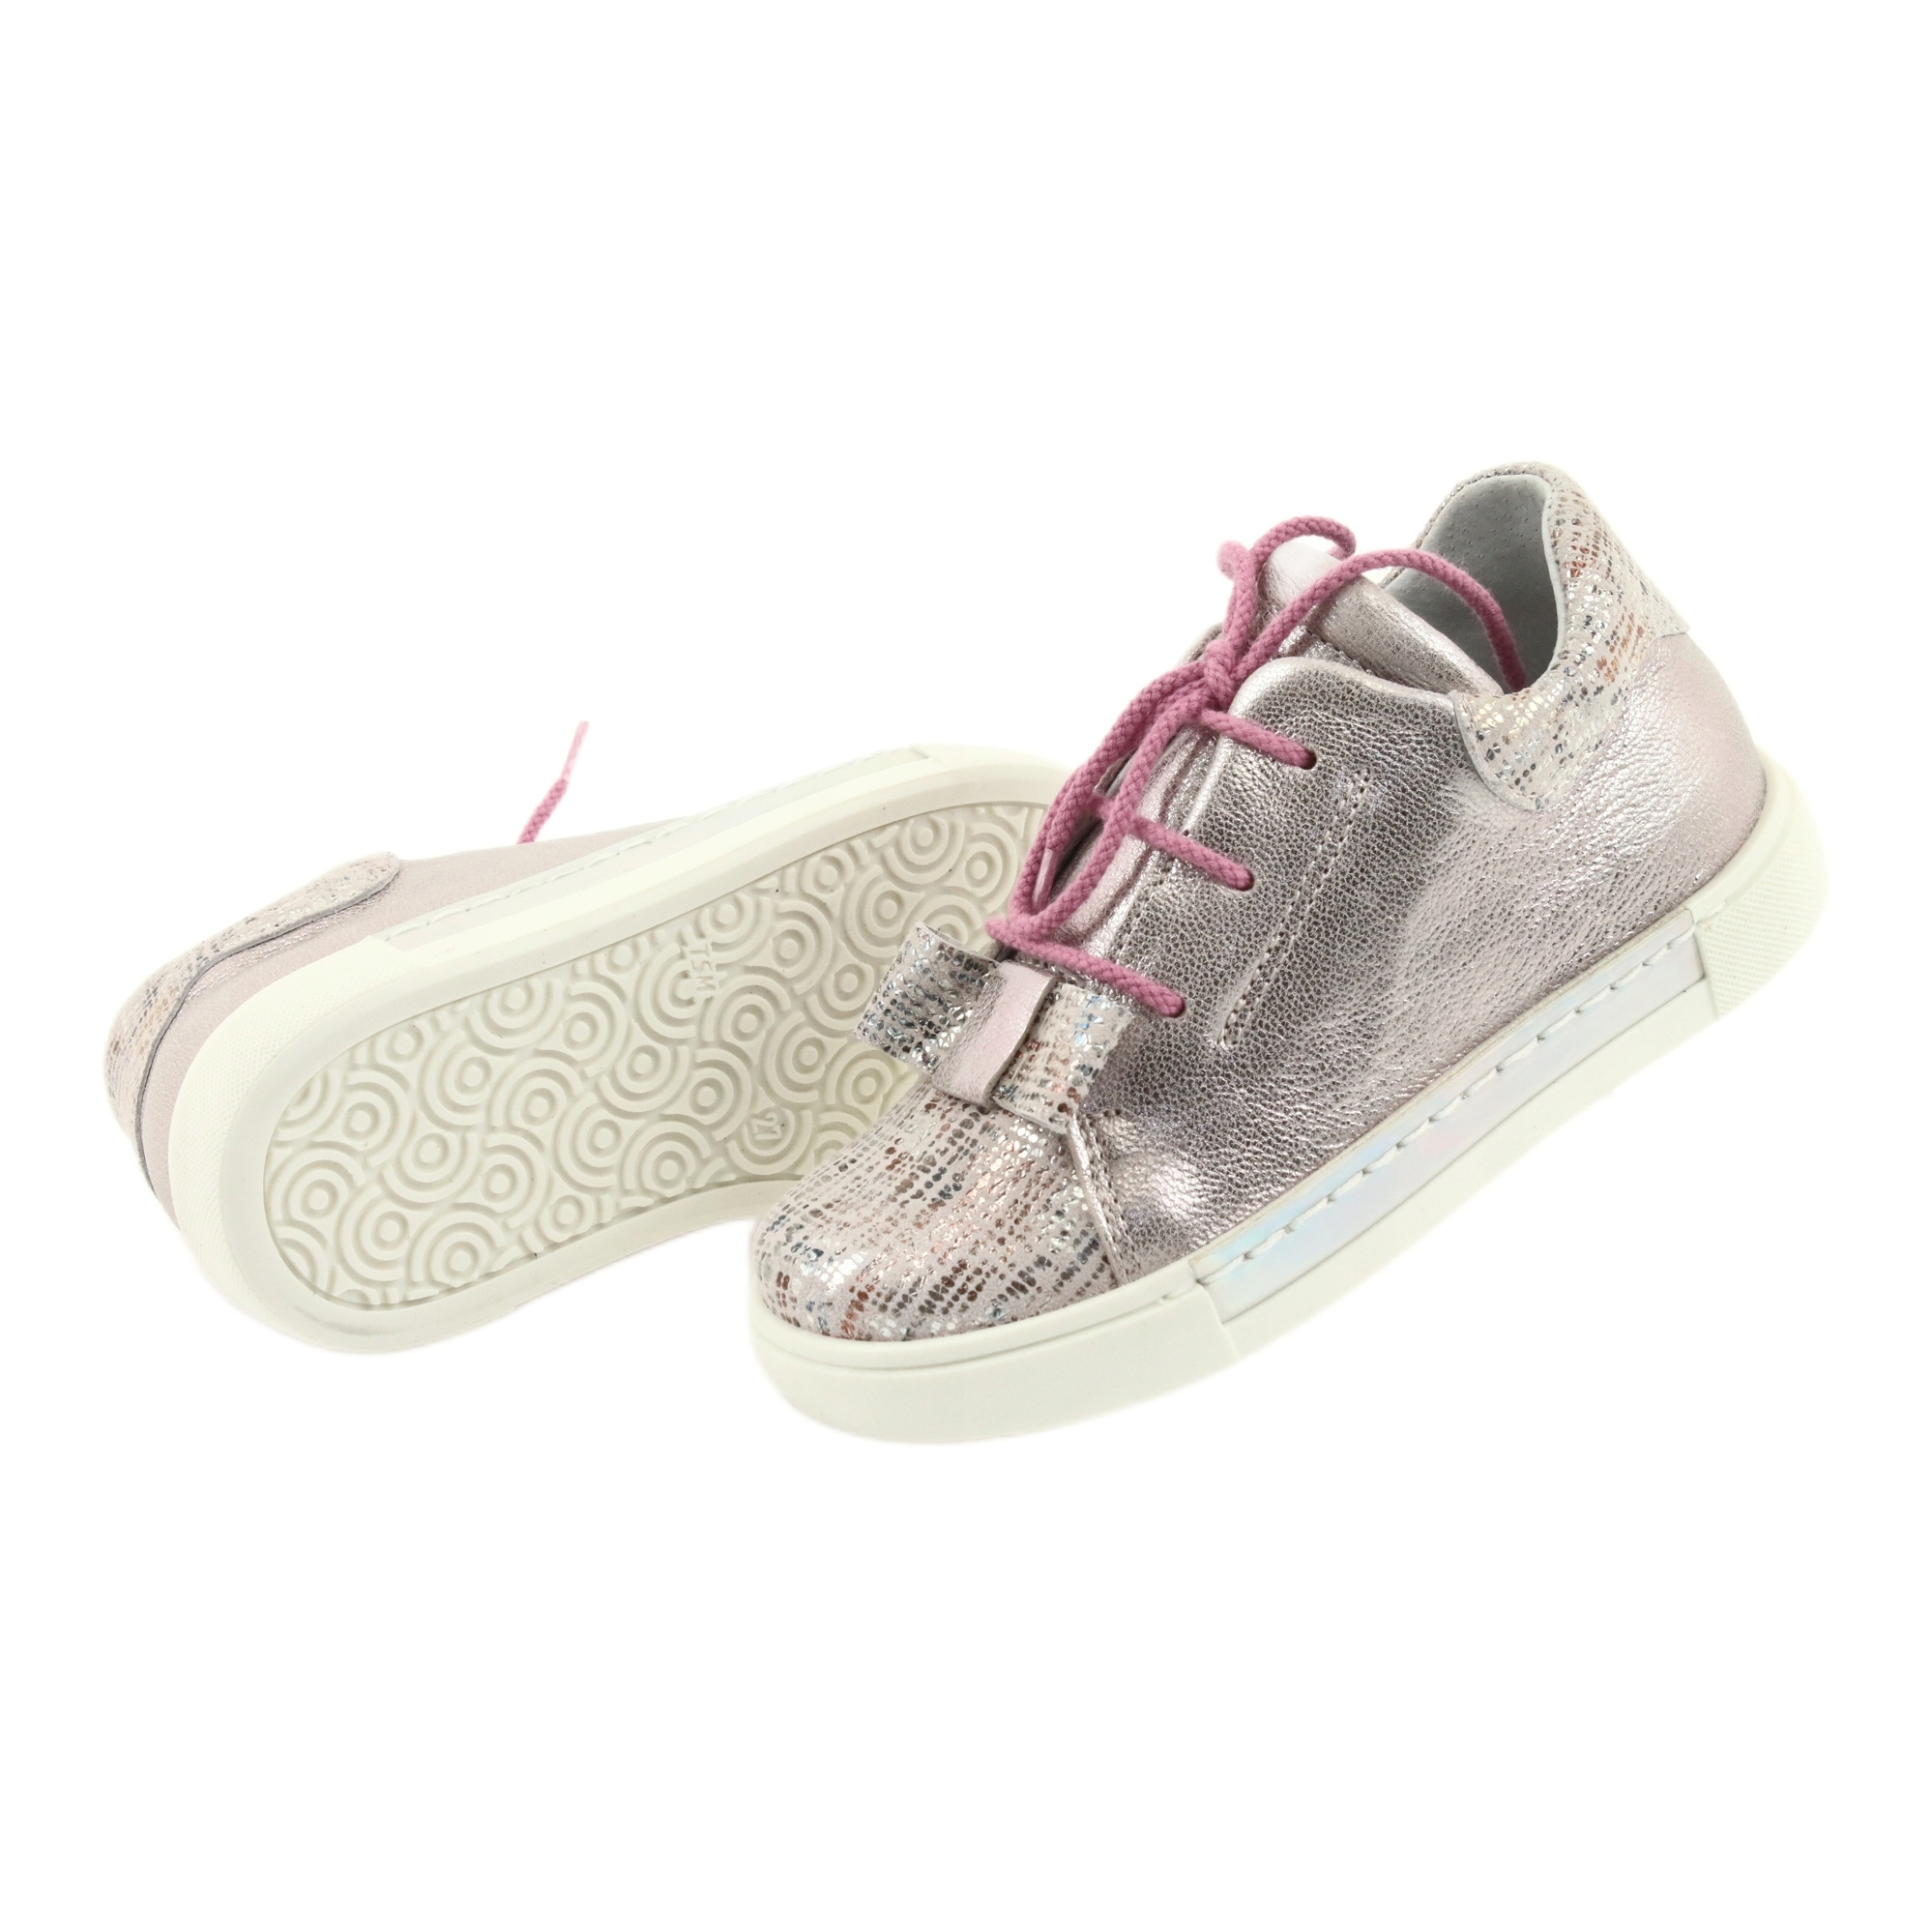 Buty skórzane sportowe Ren But 3303 perłowy róż różowe